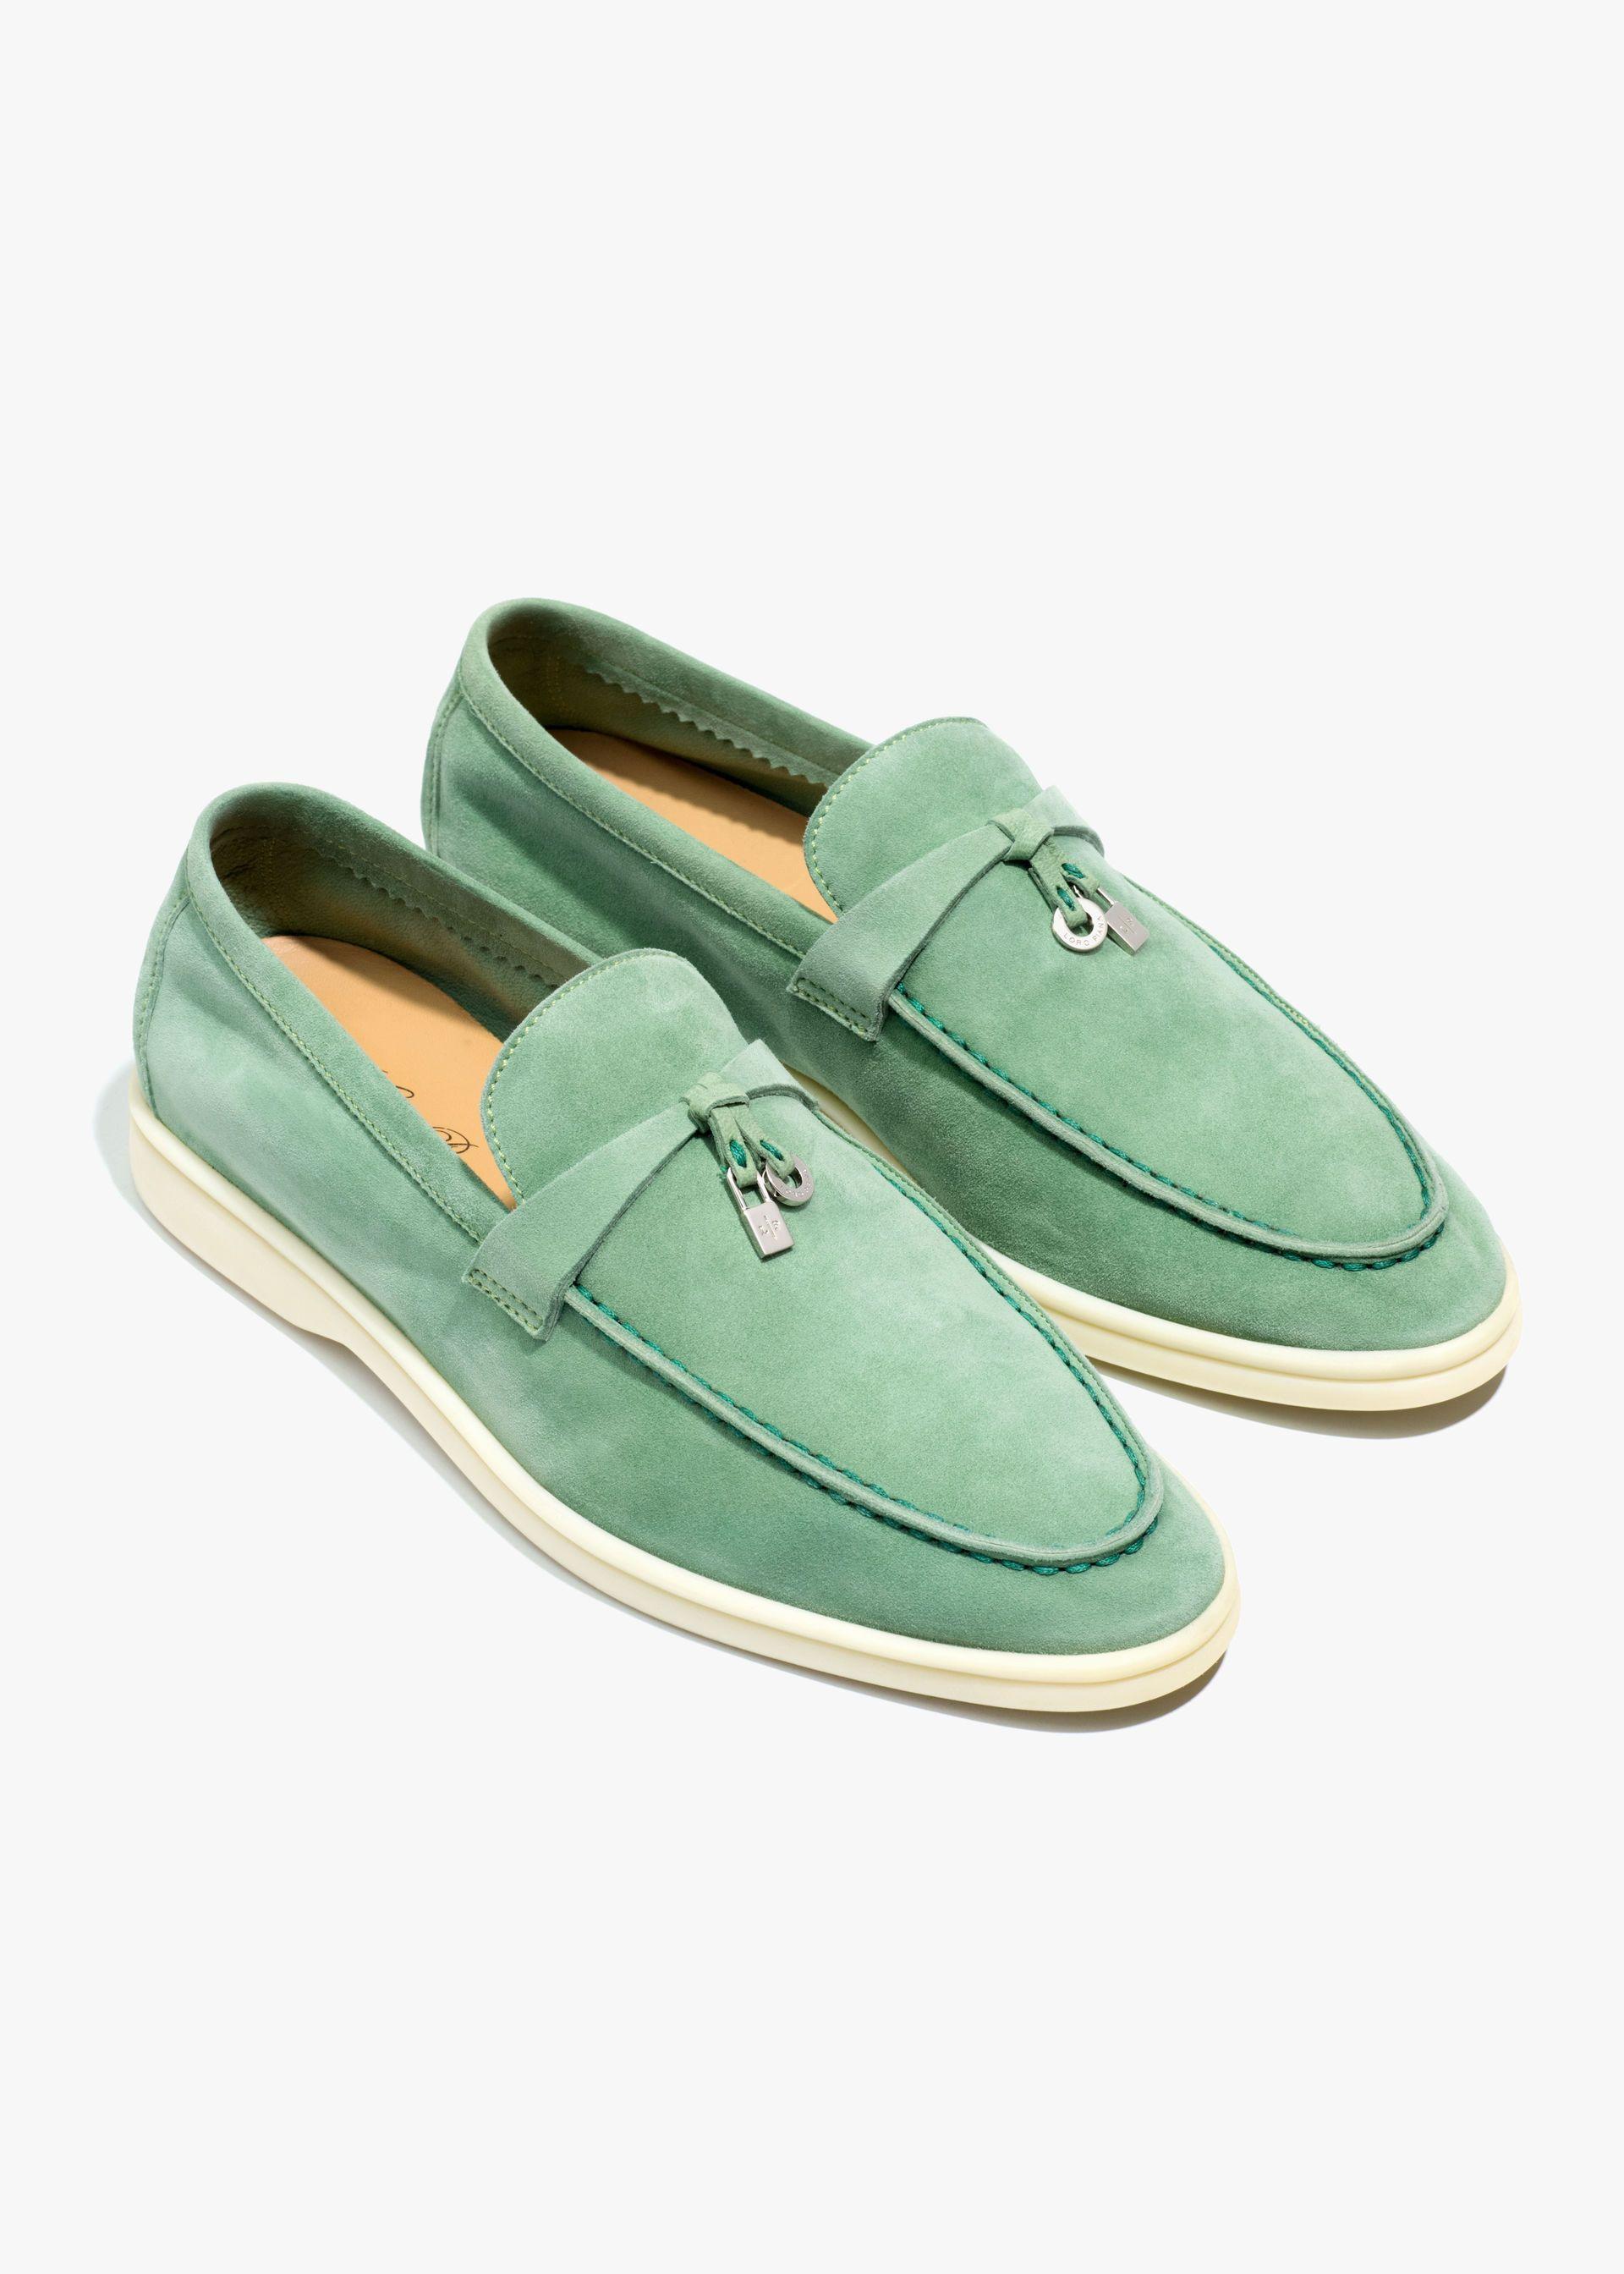 Summer Charms Walk Moccasin In Suede Calf Skin Azalea Blossom Loro Piana Dress Shoes Men Women Shoes White Sole Shoes [ 2688 x 1920 Pixel ]